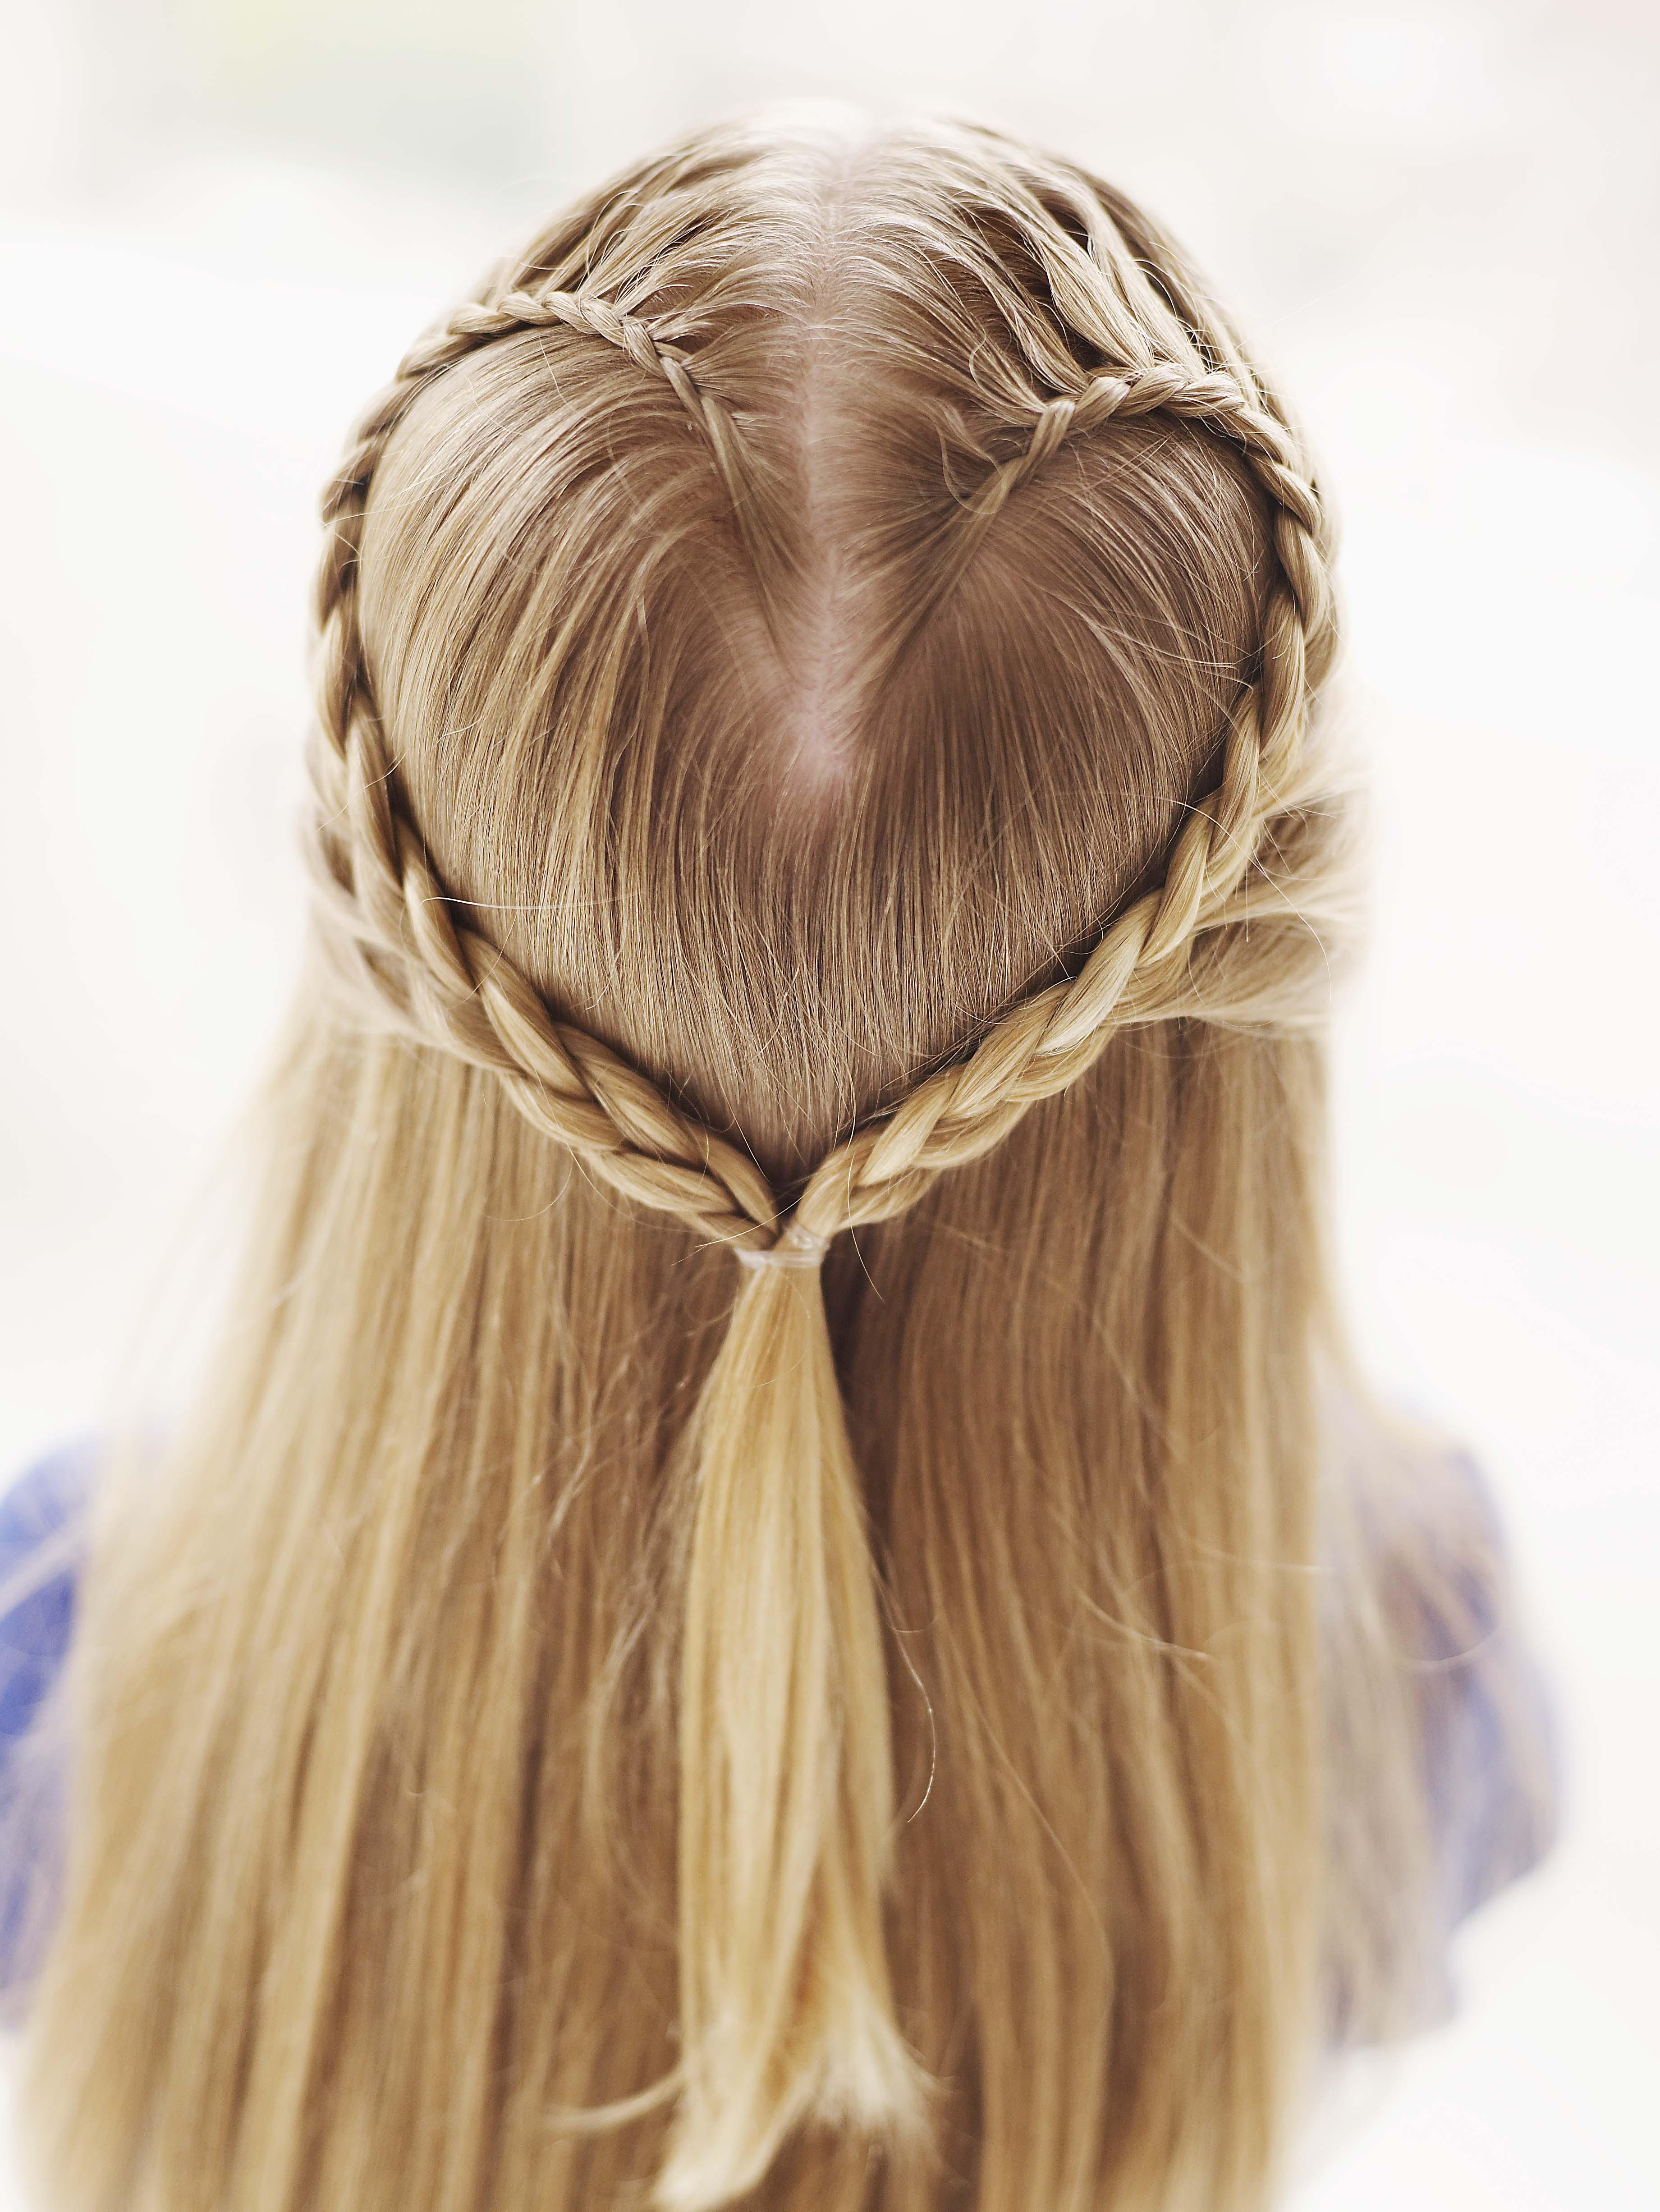 Braided Hairstyles On Tumblr Hairstyles Ideas Braided Hairstyles